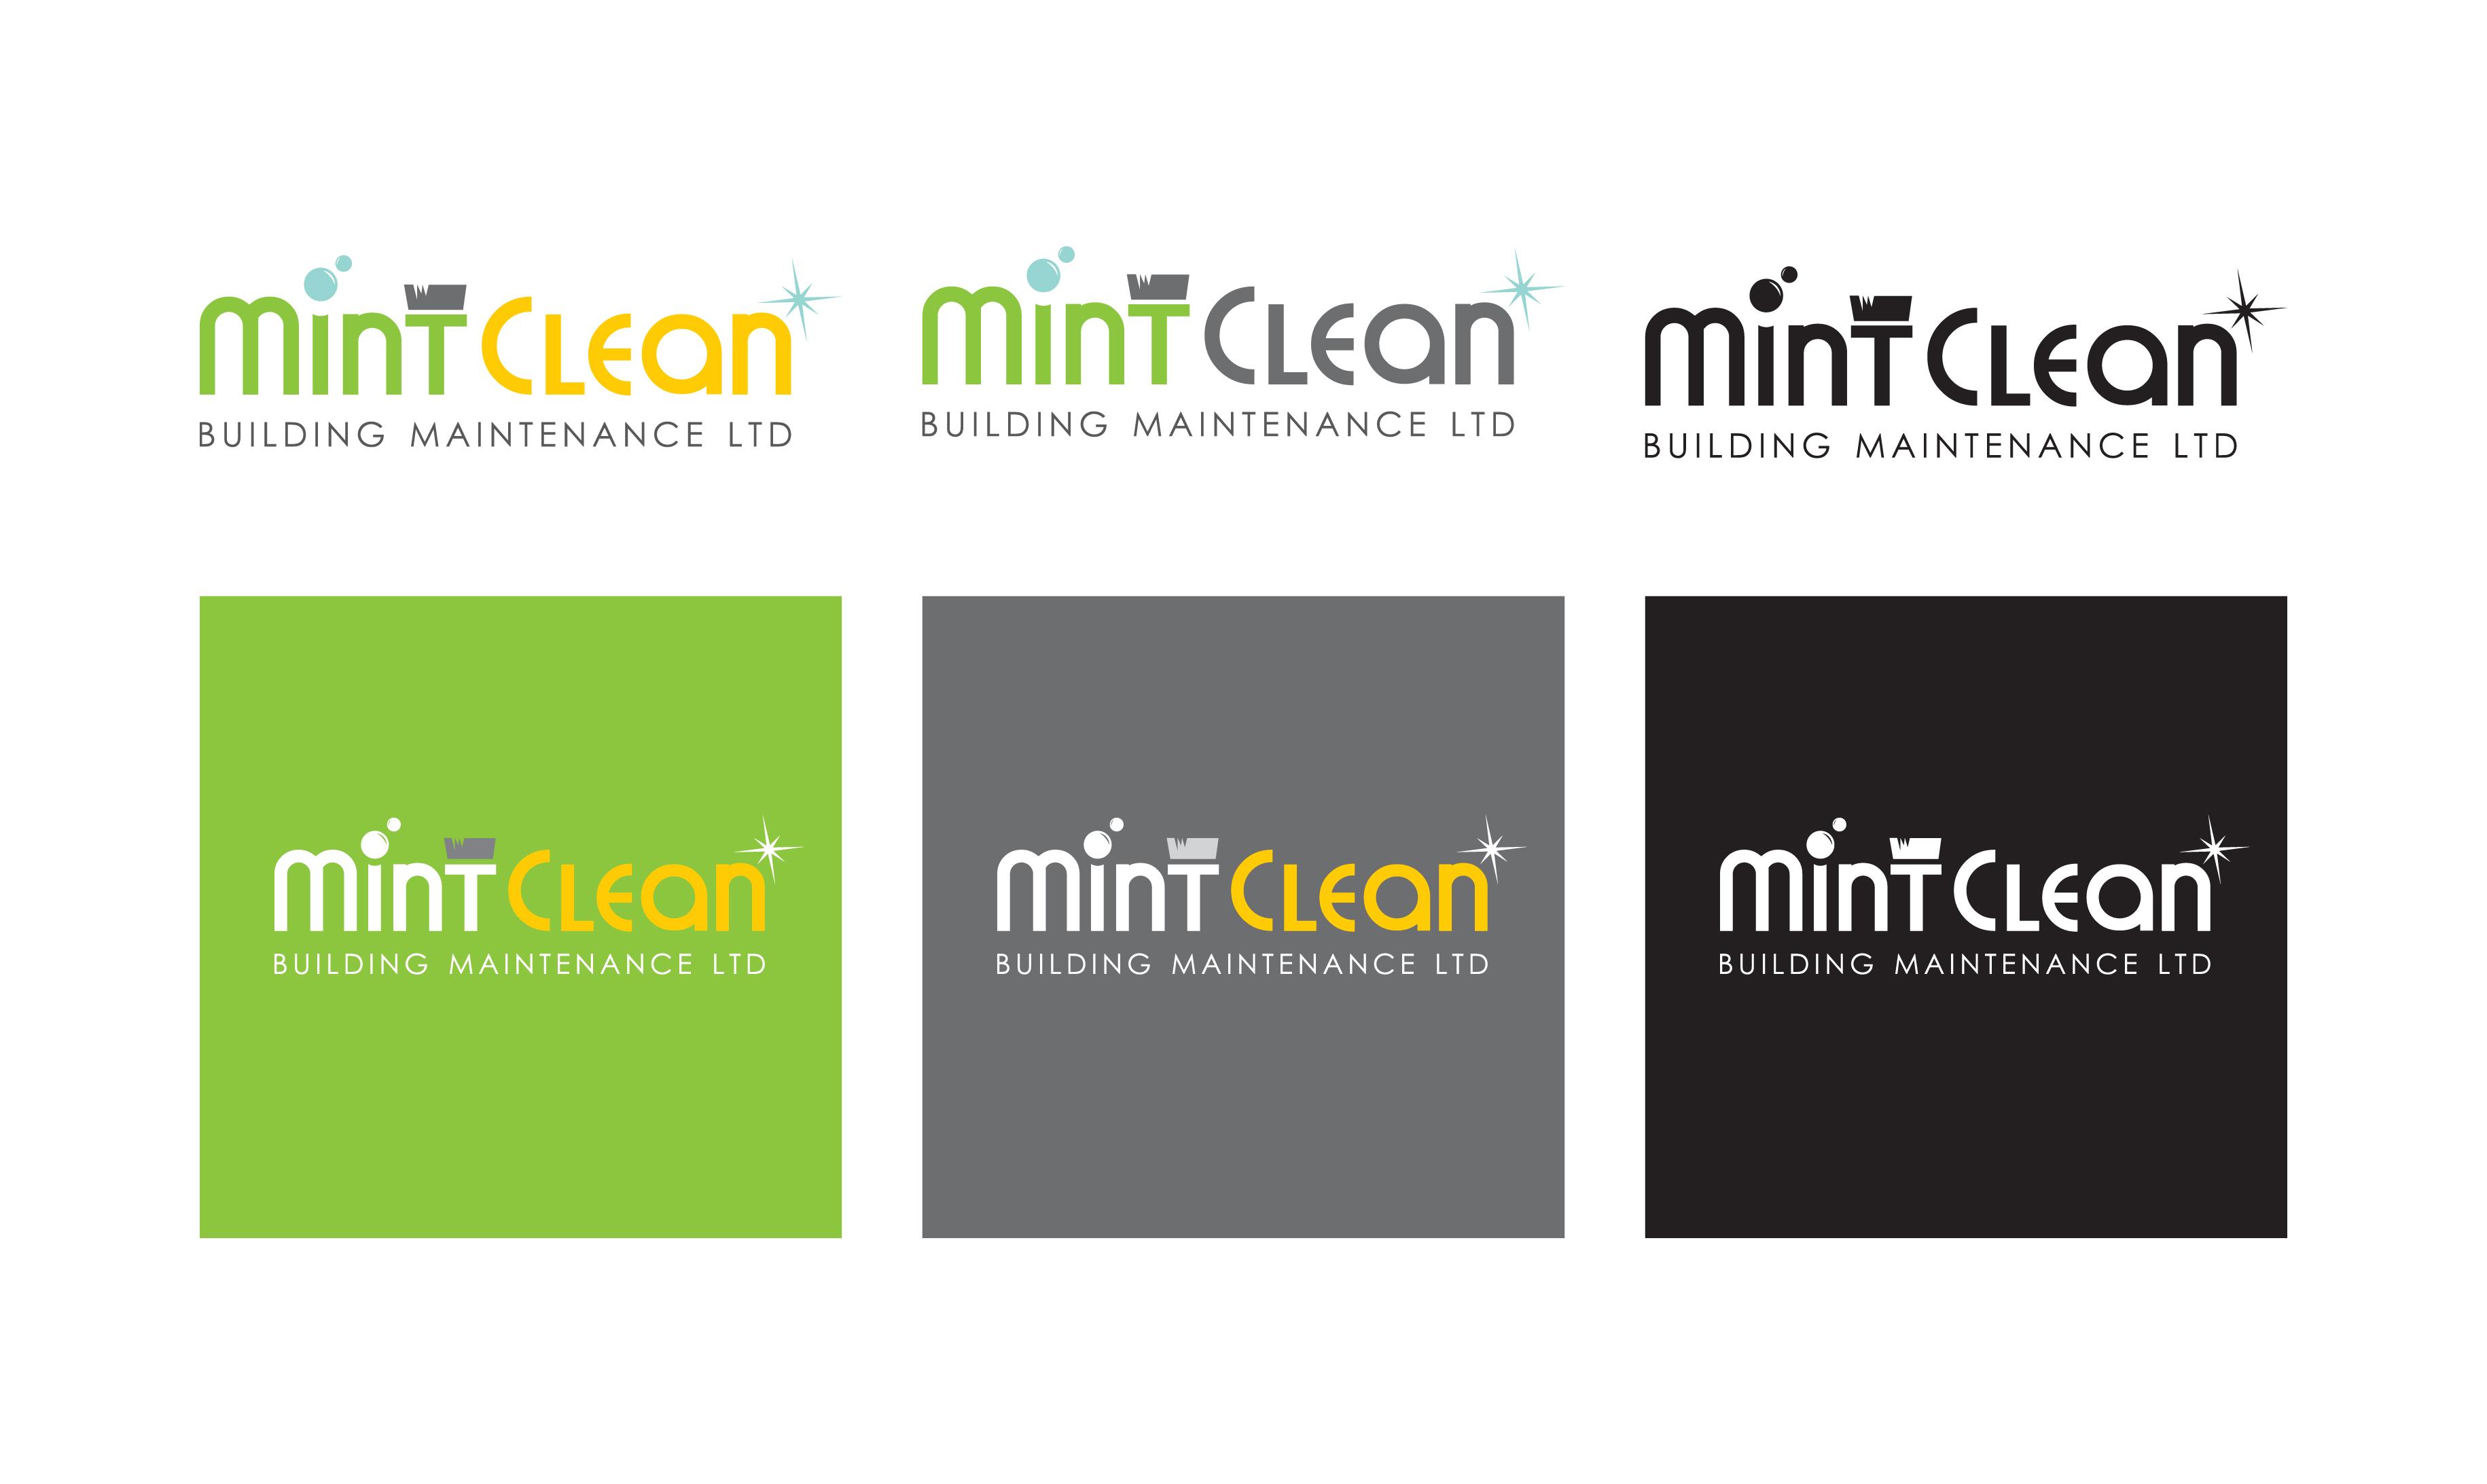 Logo Design by Vasil Boyadzhiev - Entry No. 107 in the Logo Design Contest MintClean Building Maintenance Ltd. Logo Design.